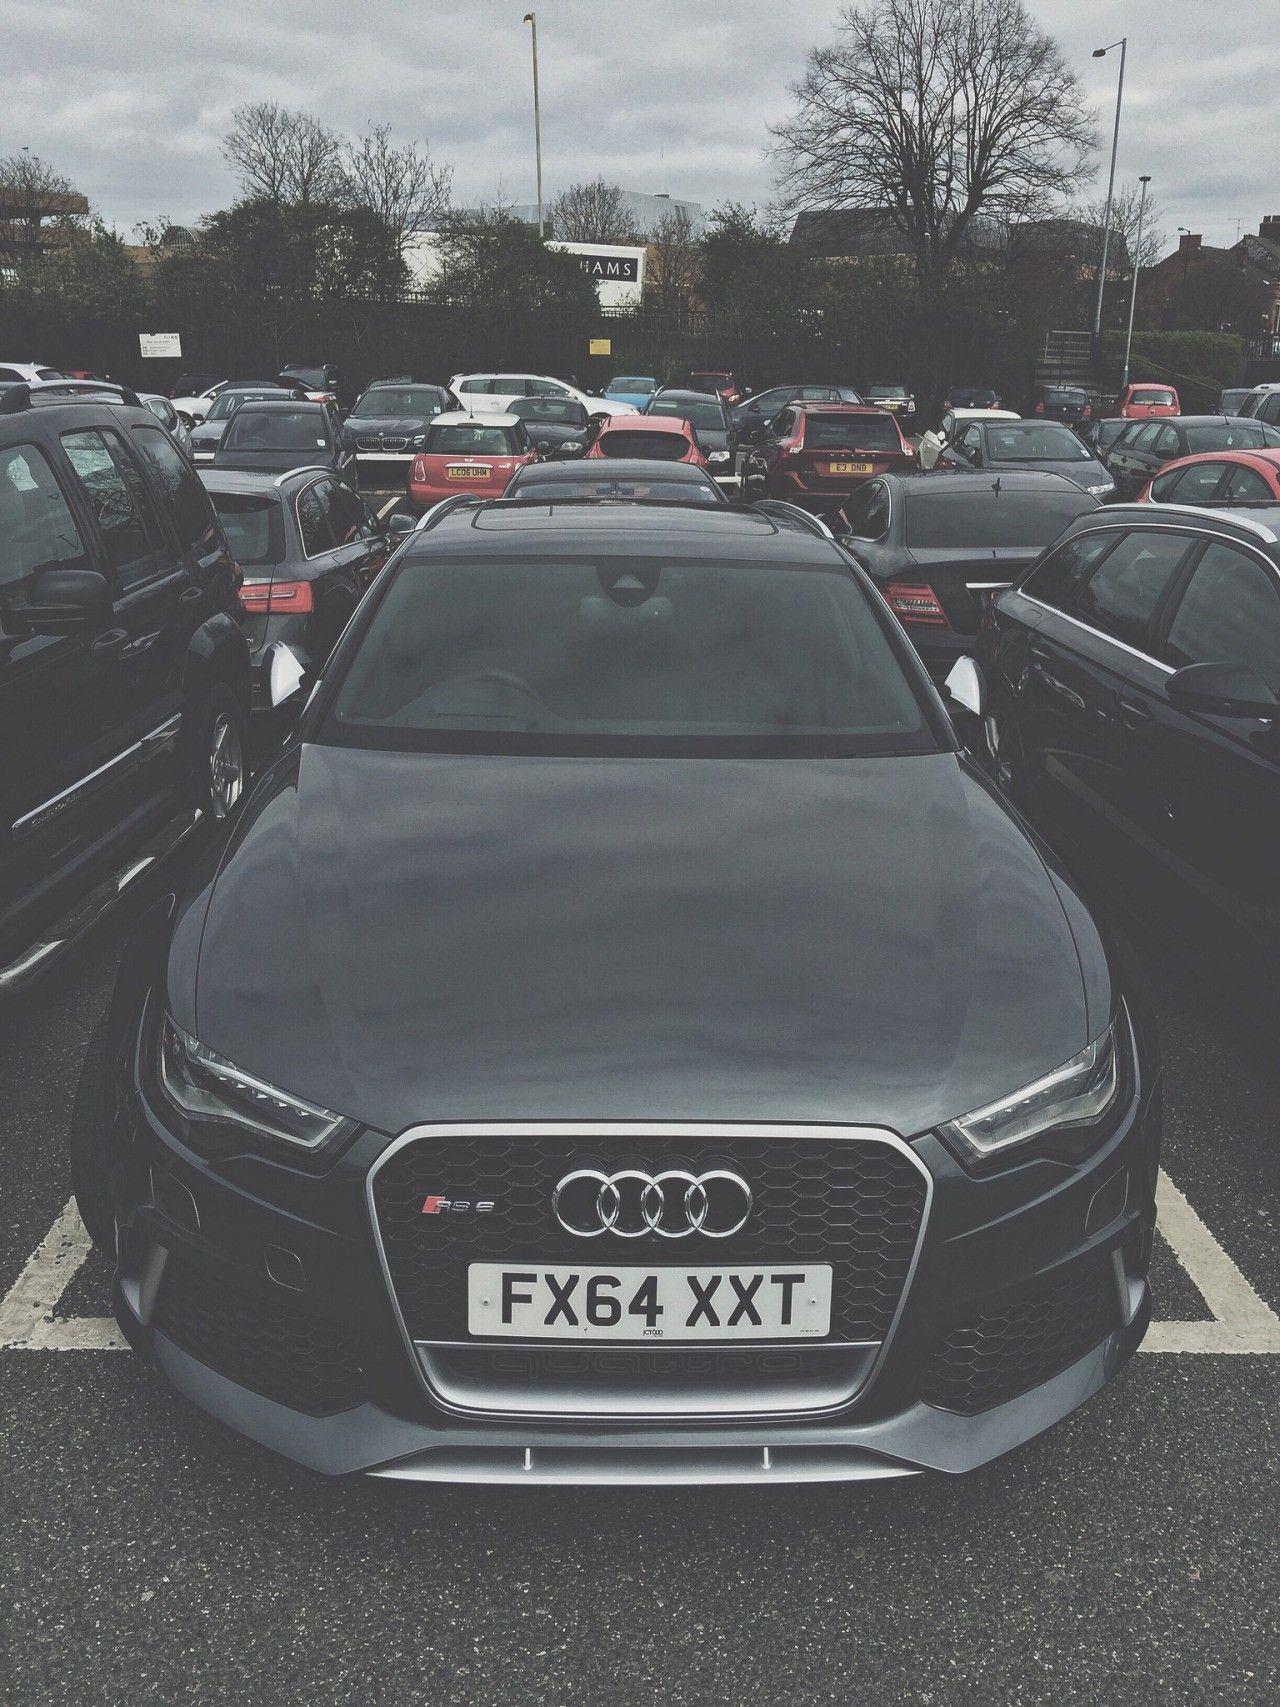 Audi, RS6, Audi RS6 Avant, Quattro, Car Wallpapers HD / Desktop ...